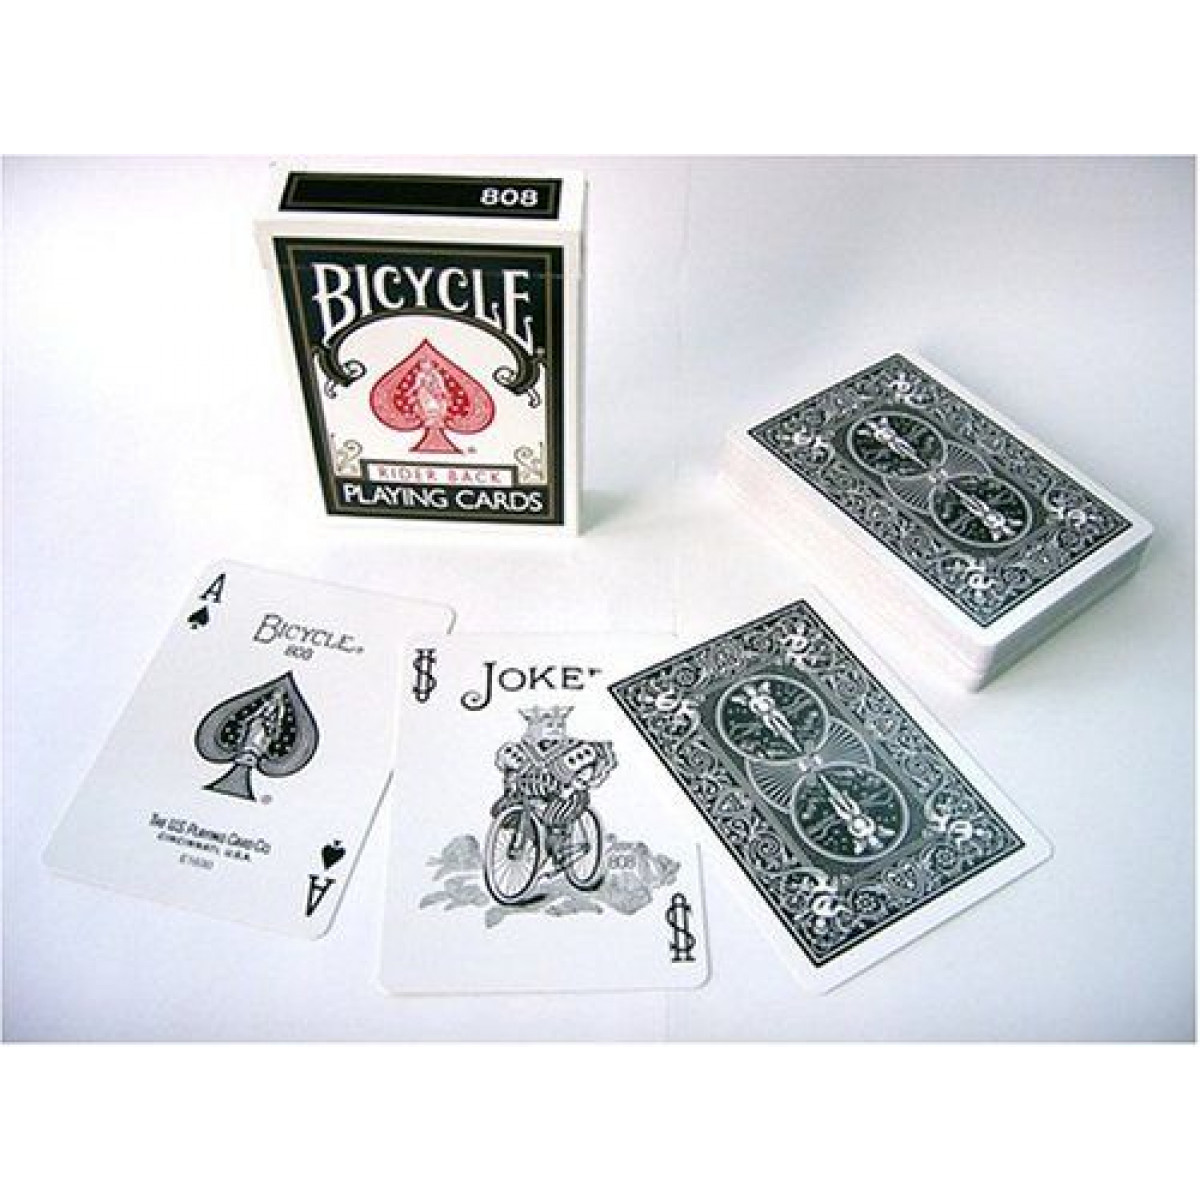 Blu-Rosso 2 mazzi Carte Bicycle Standard Index